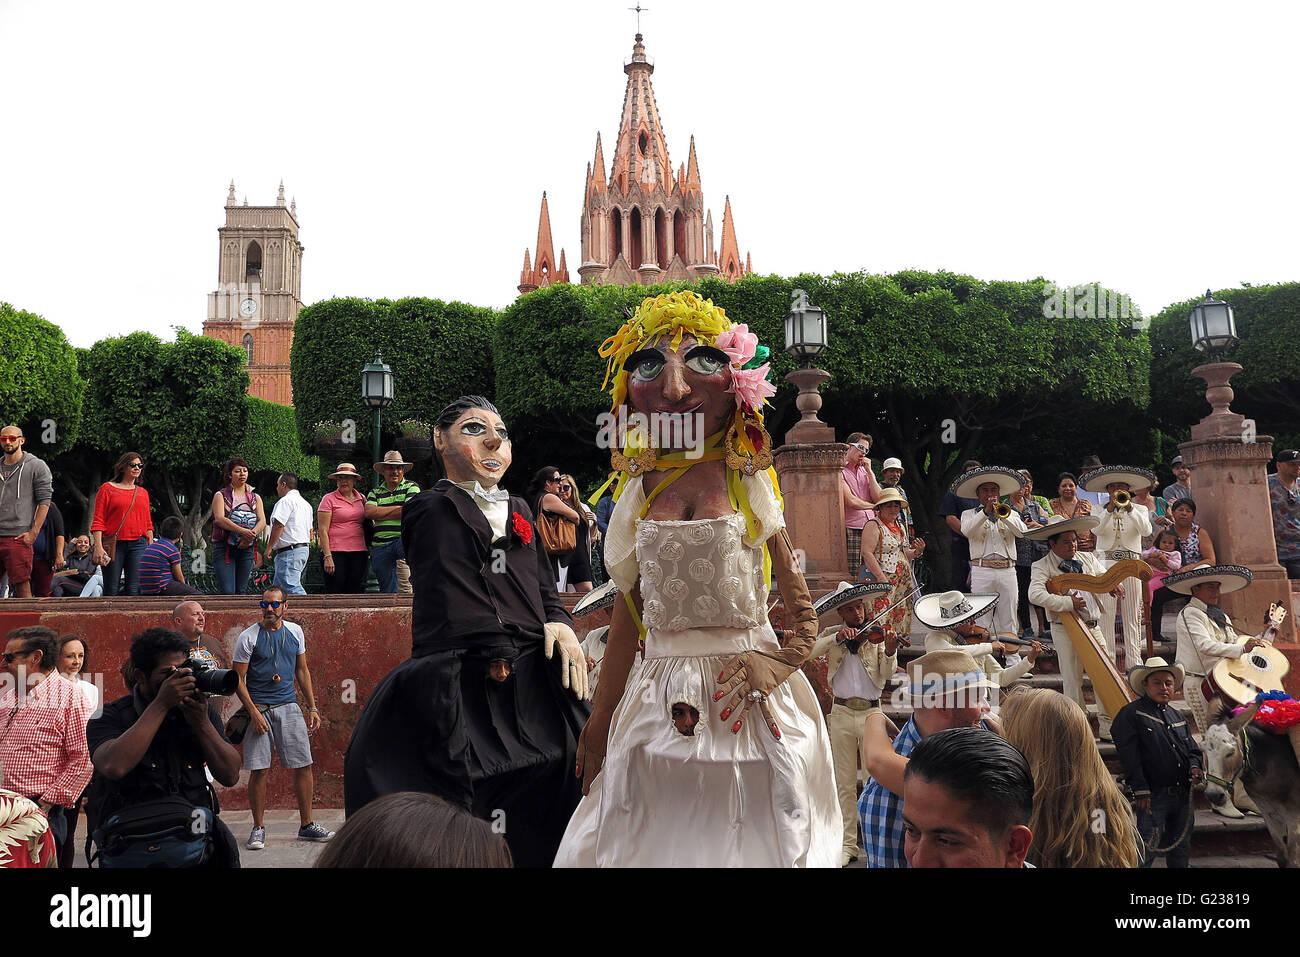 San Miguel De Allende, Mexico. 18th Apr, 2016. A wedding parade marches through the streets in San Miguel de Allende. - Stock Image